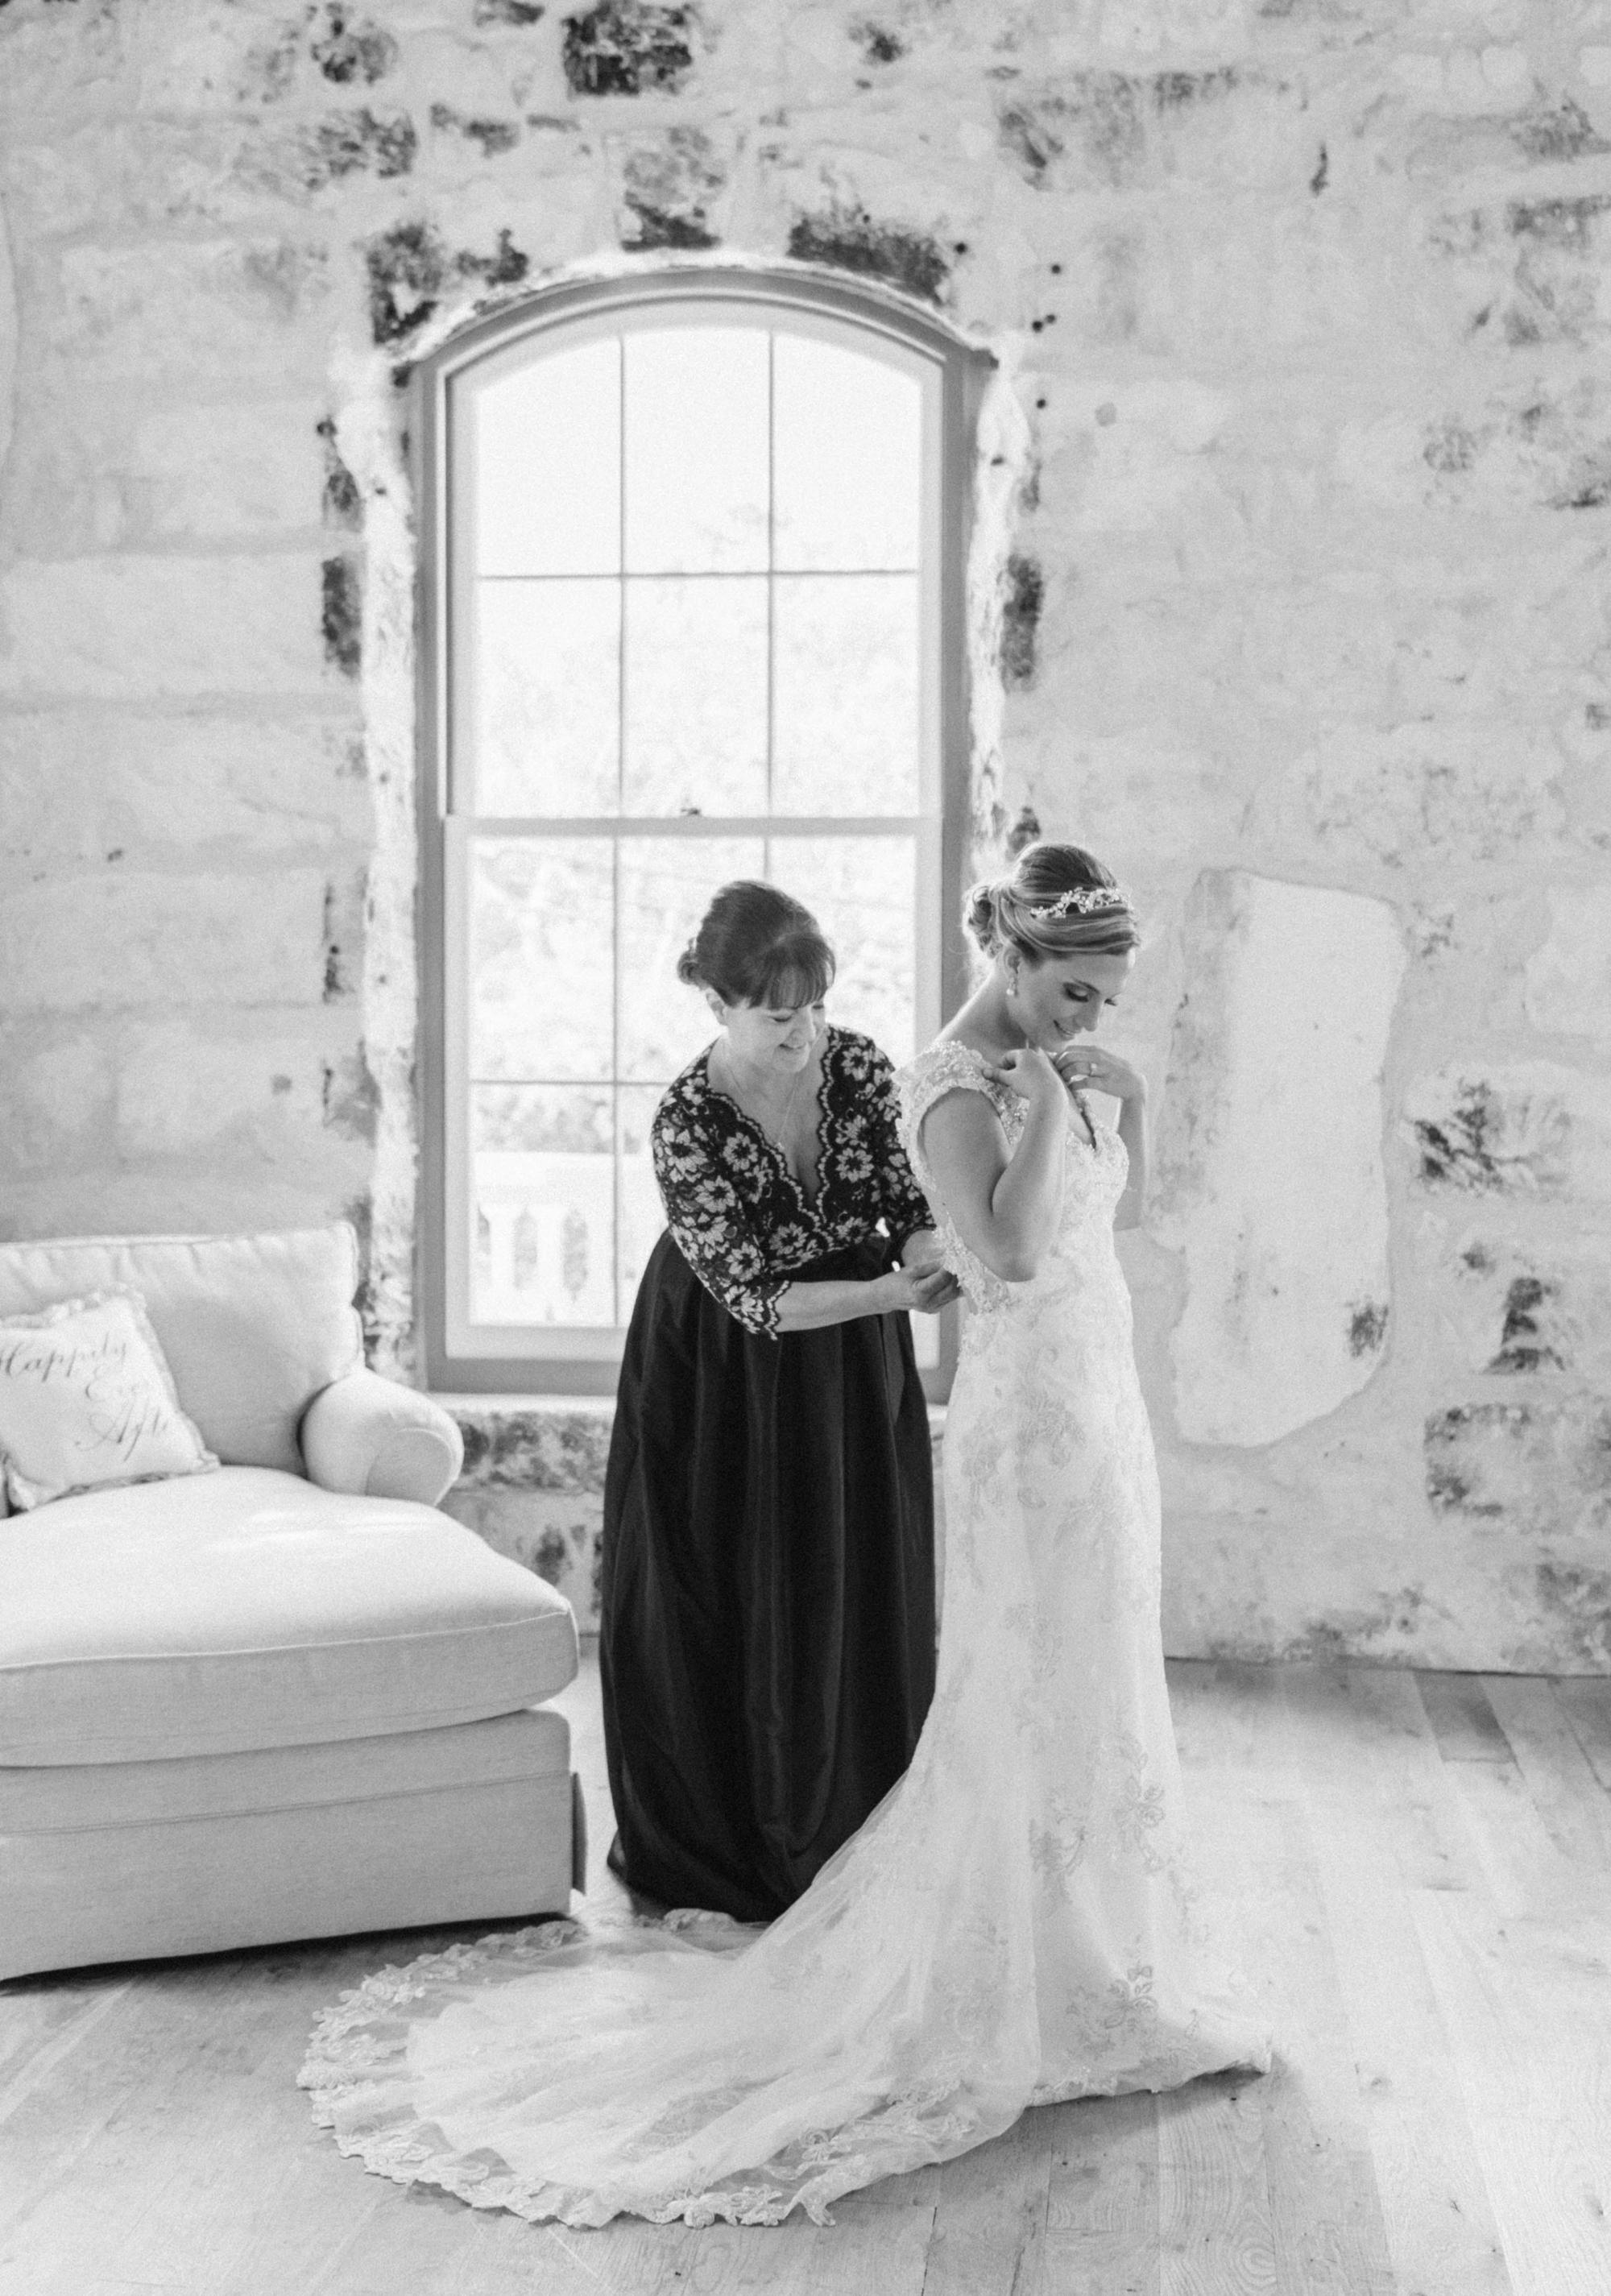 austin-texas-wedding-photography-1778-photographie-29.jpg